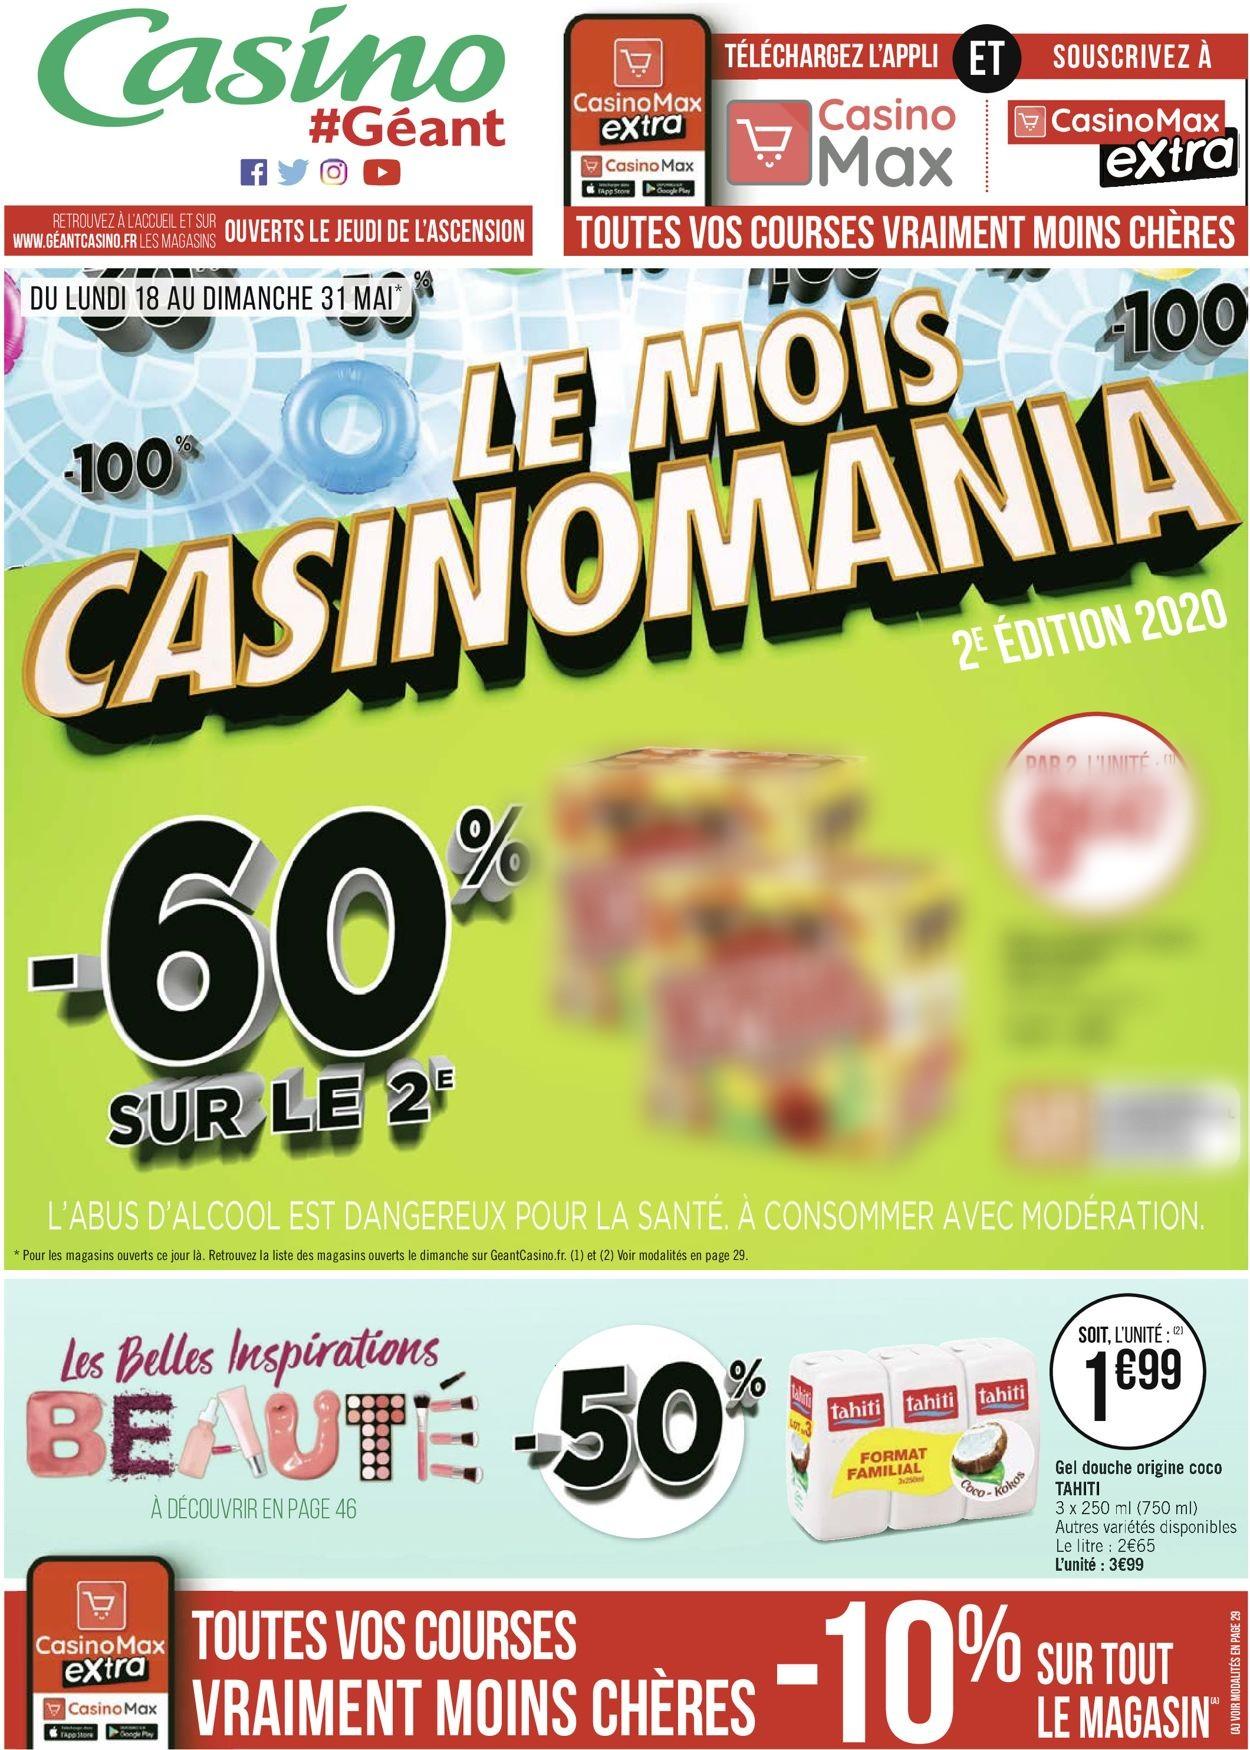 Géant Casino Catalogue - 18.05-31.05.2020